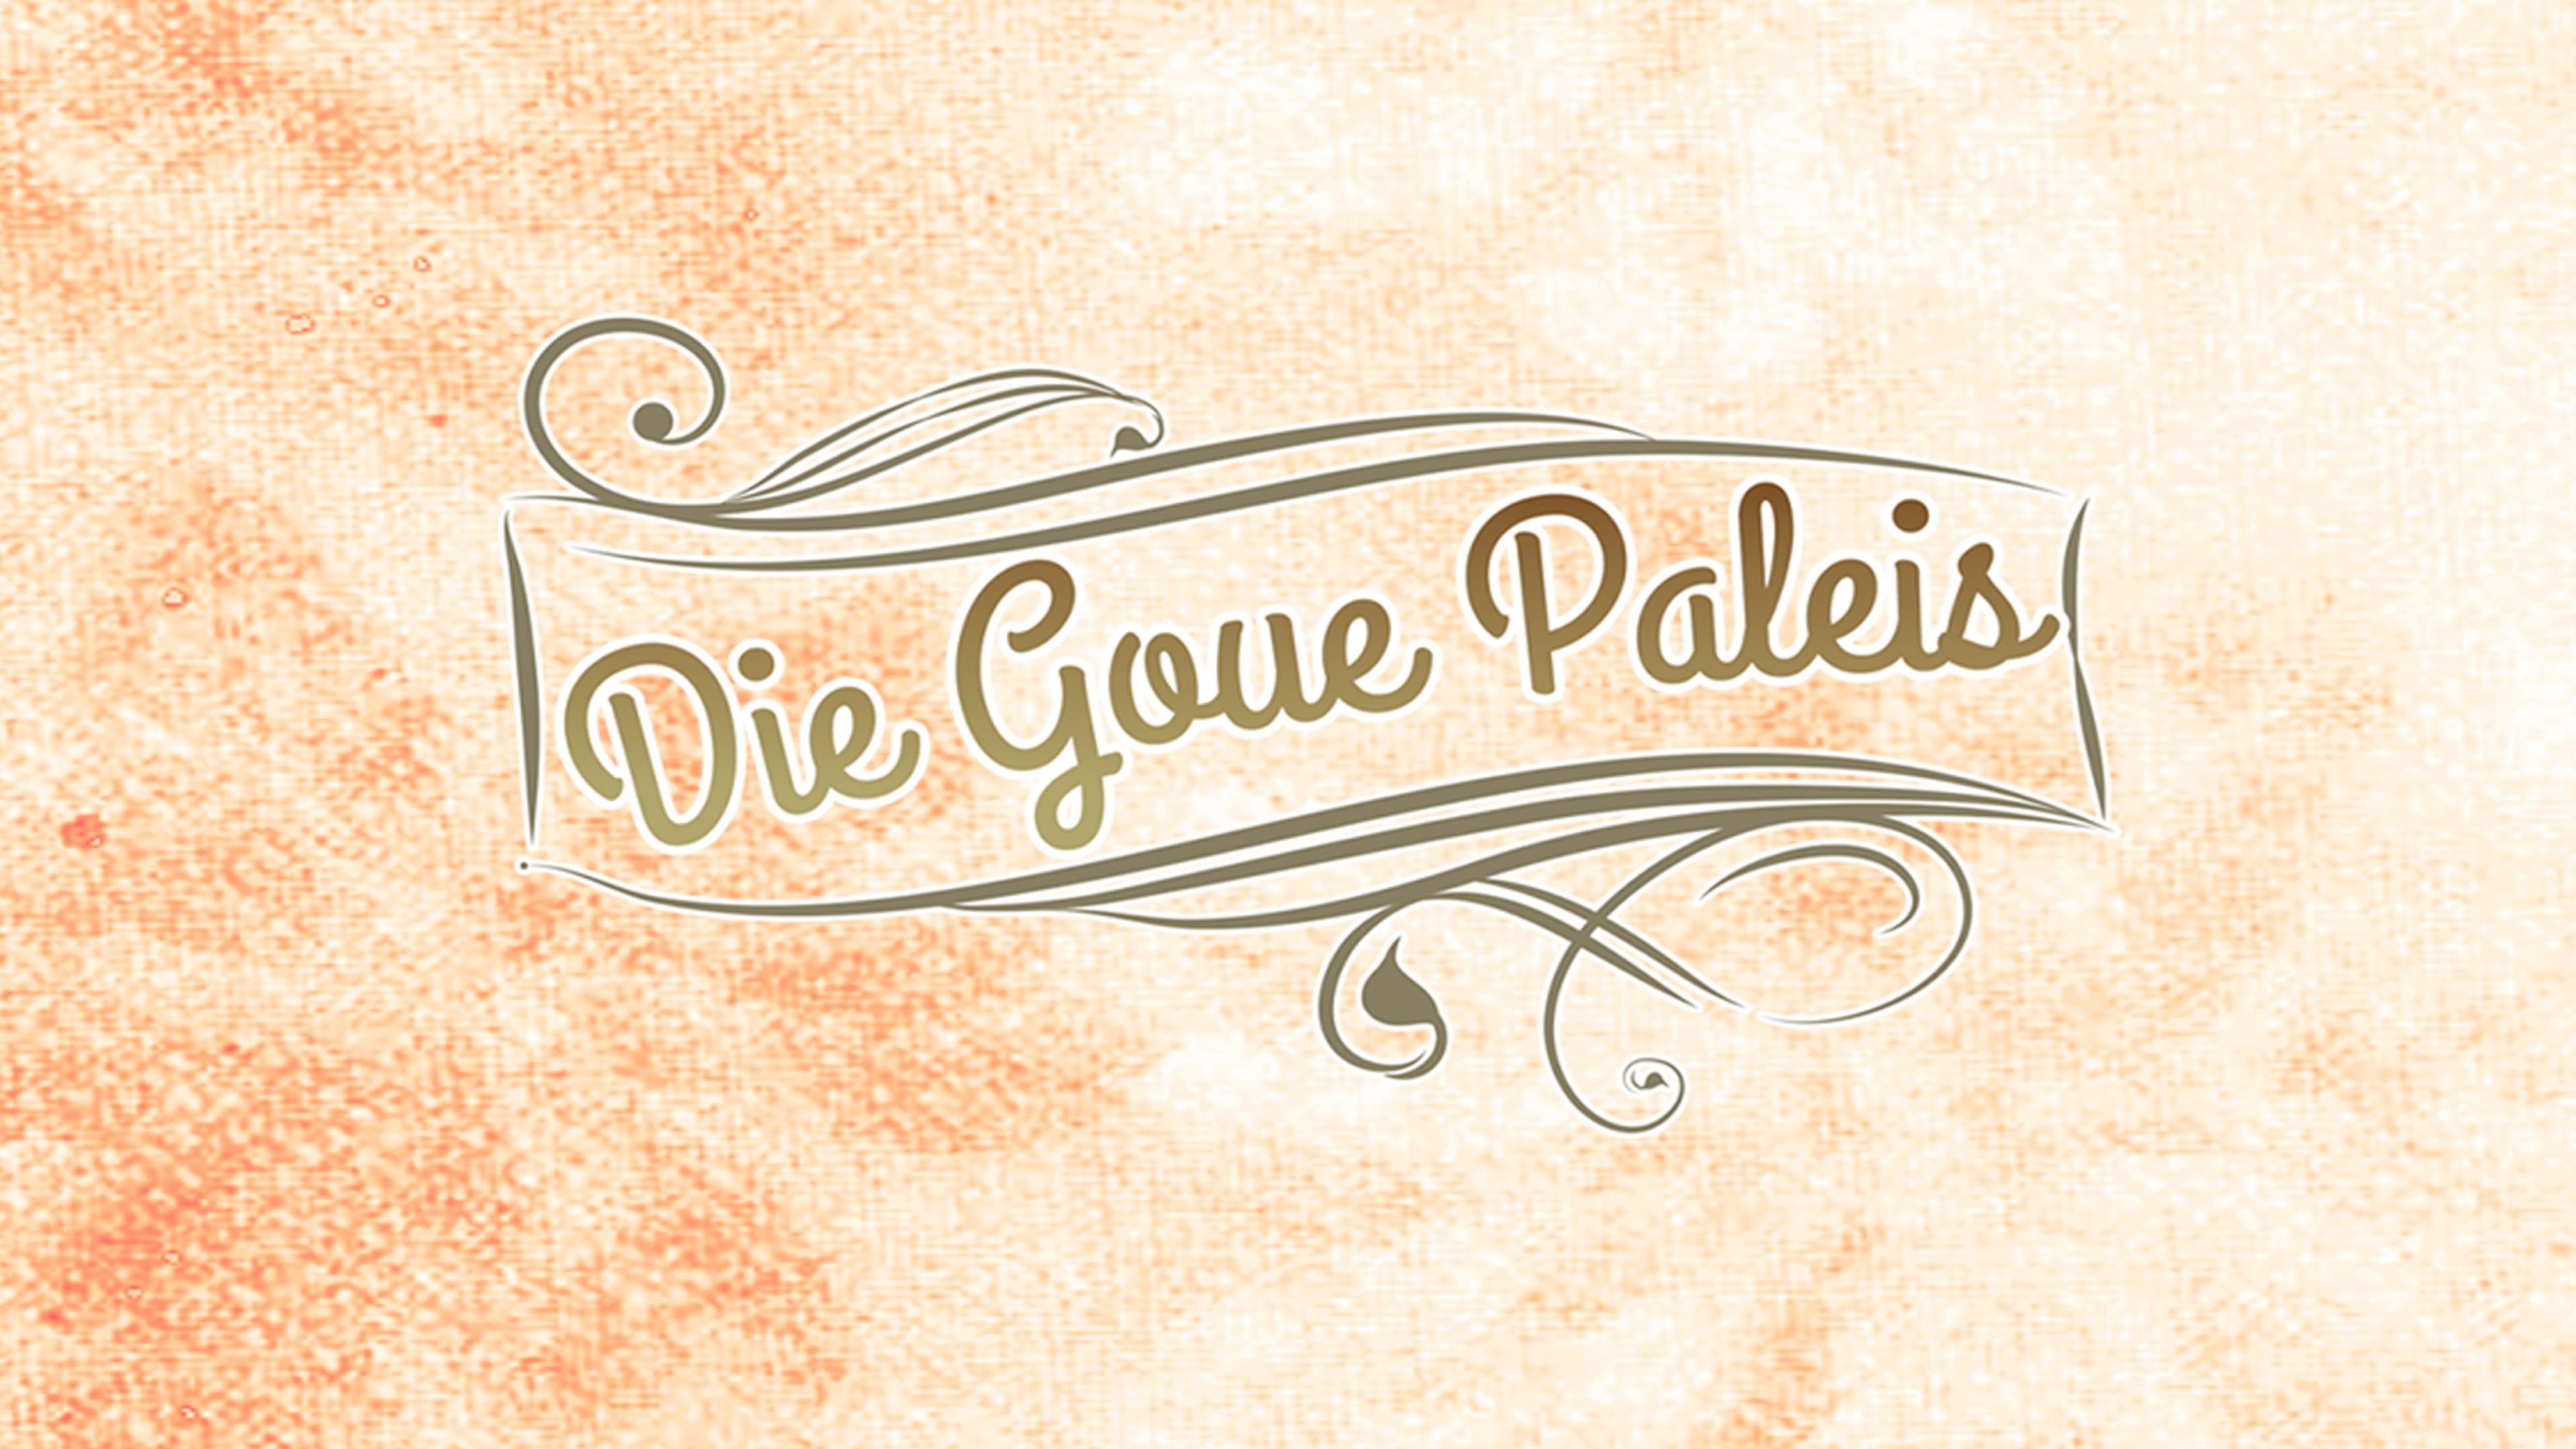 Die Goue Paleis - Season 1 Episode 1 : Episode 1